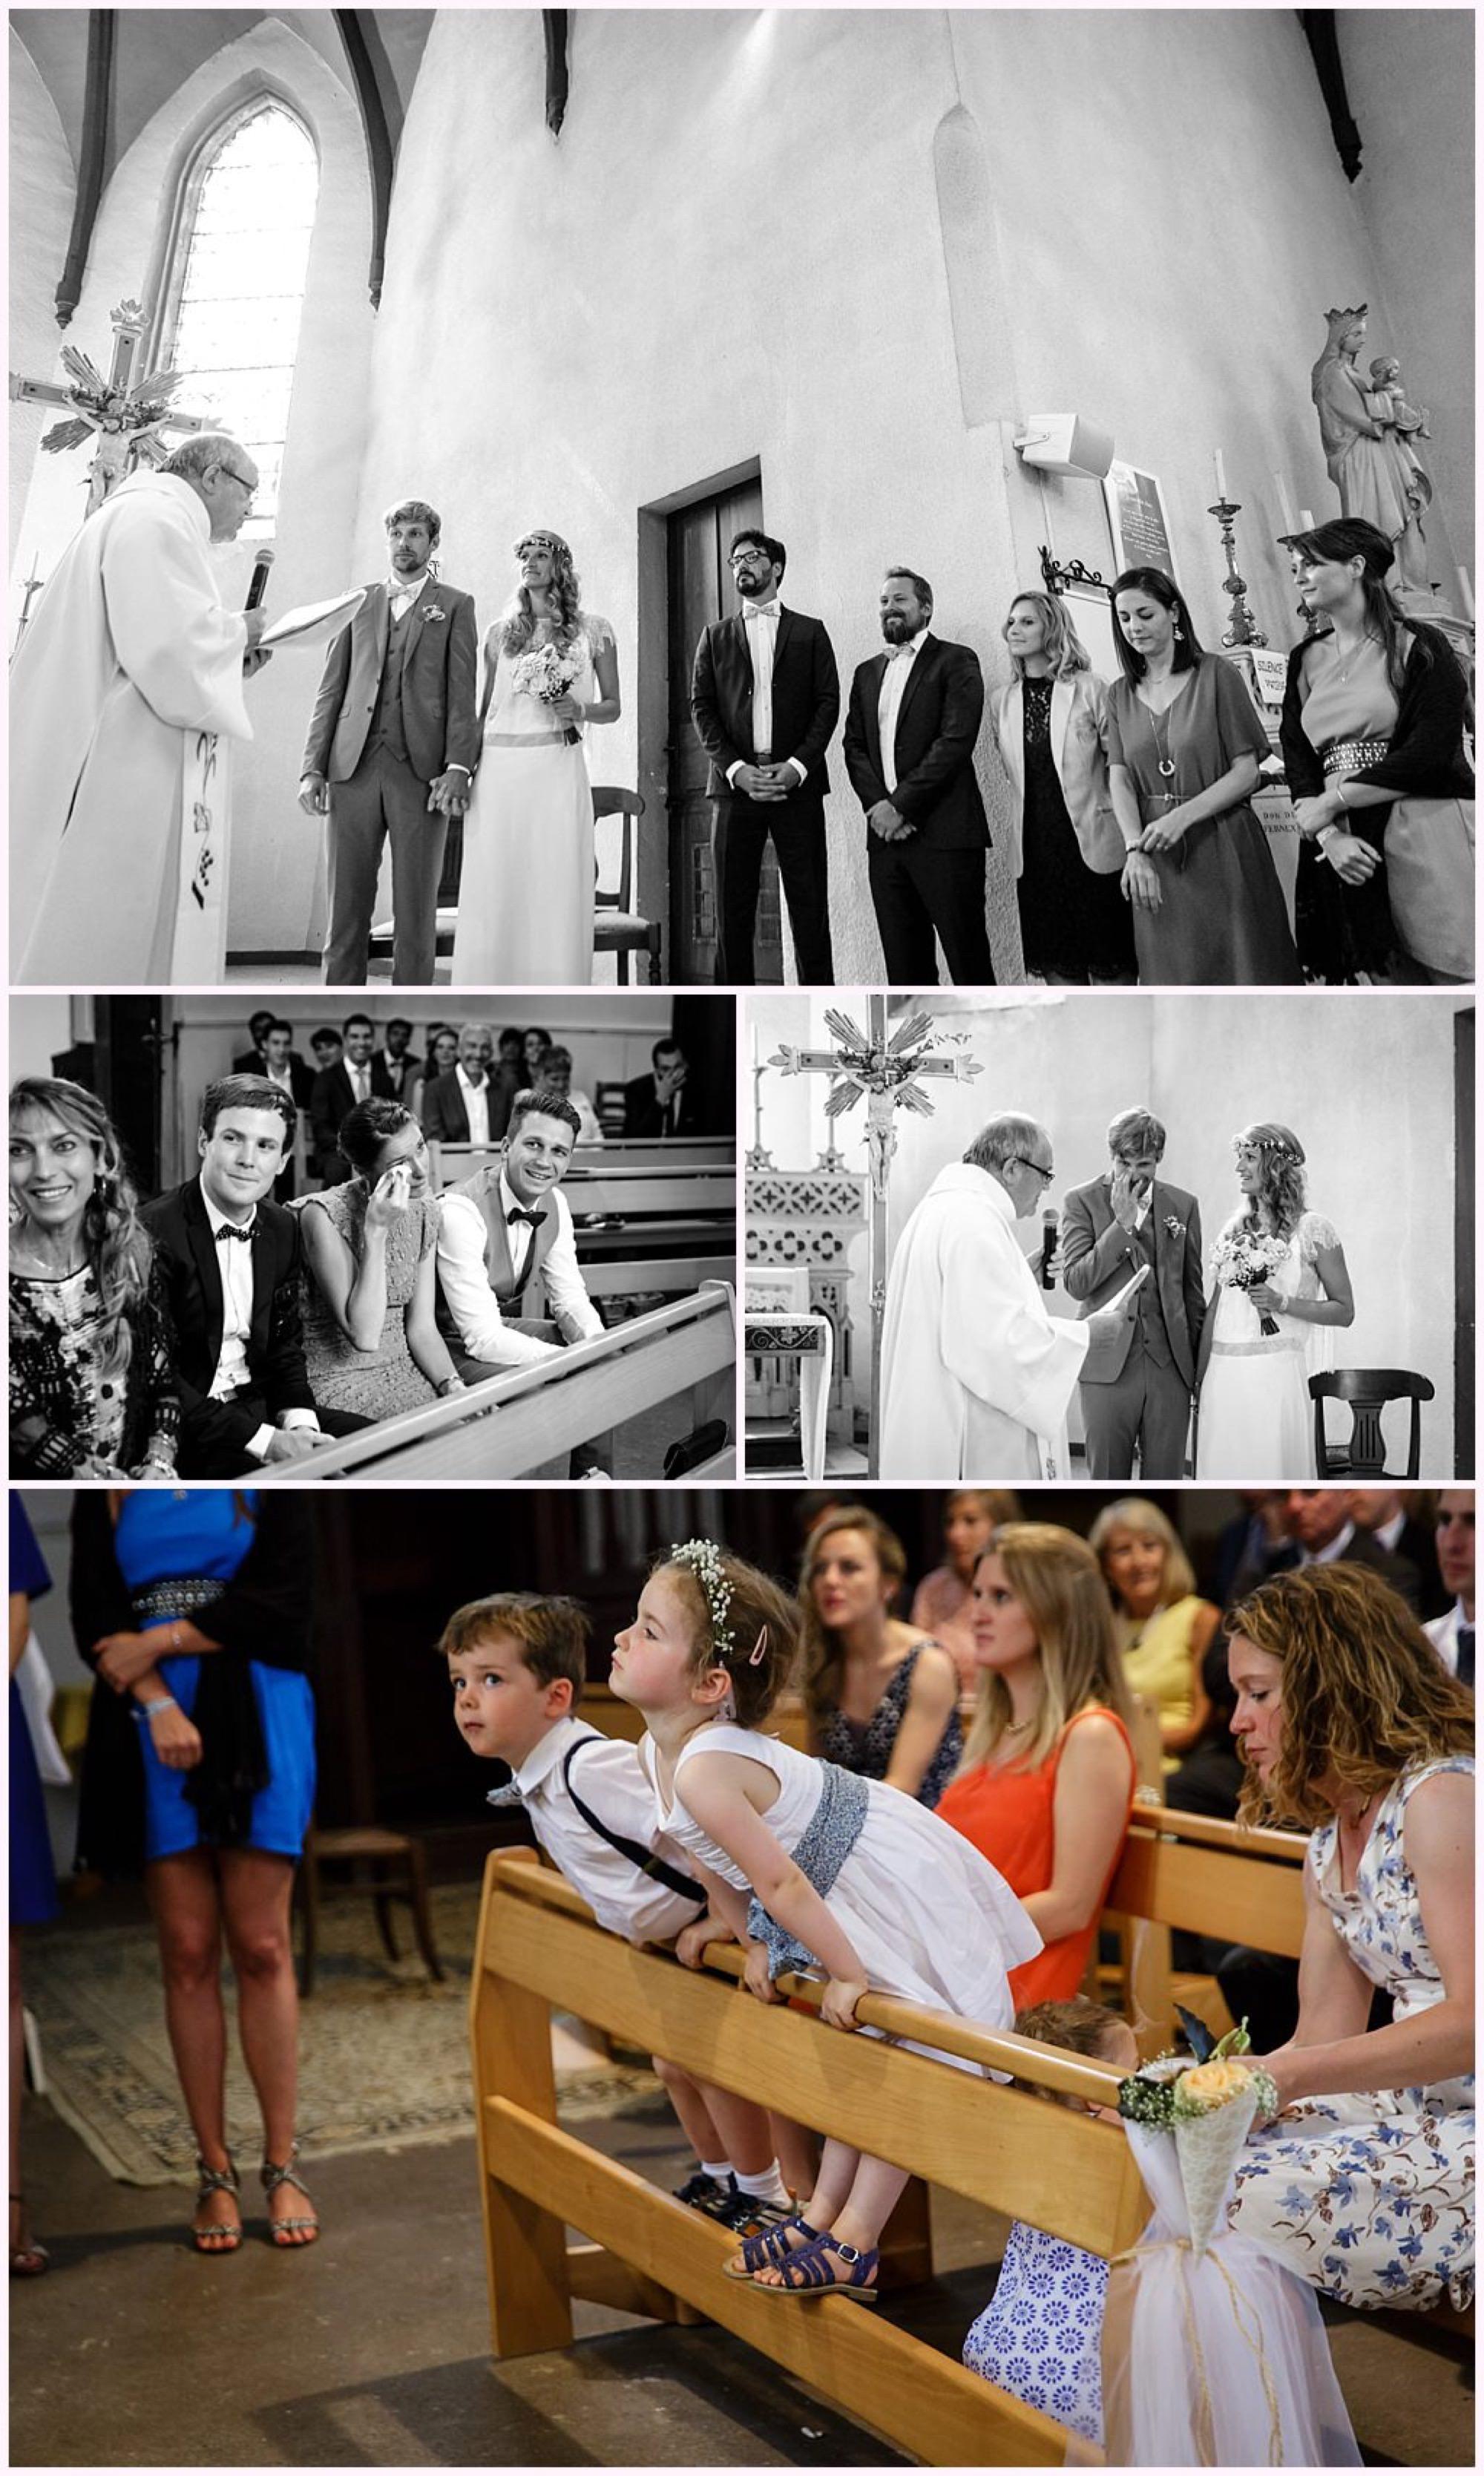 cérémonie mariage photographe mariage chambery